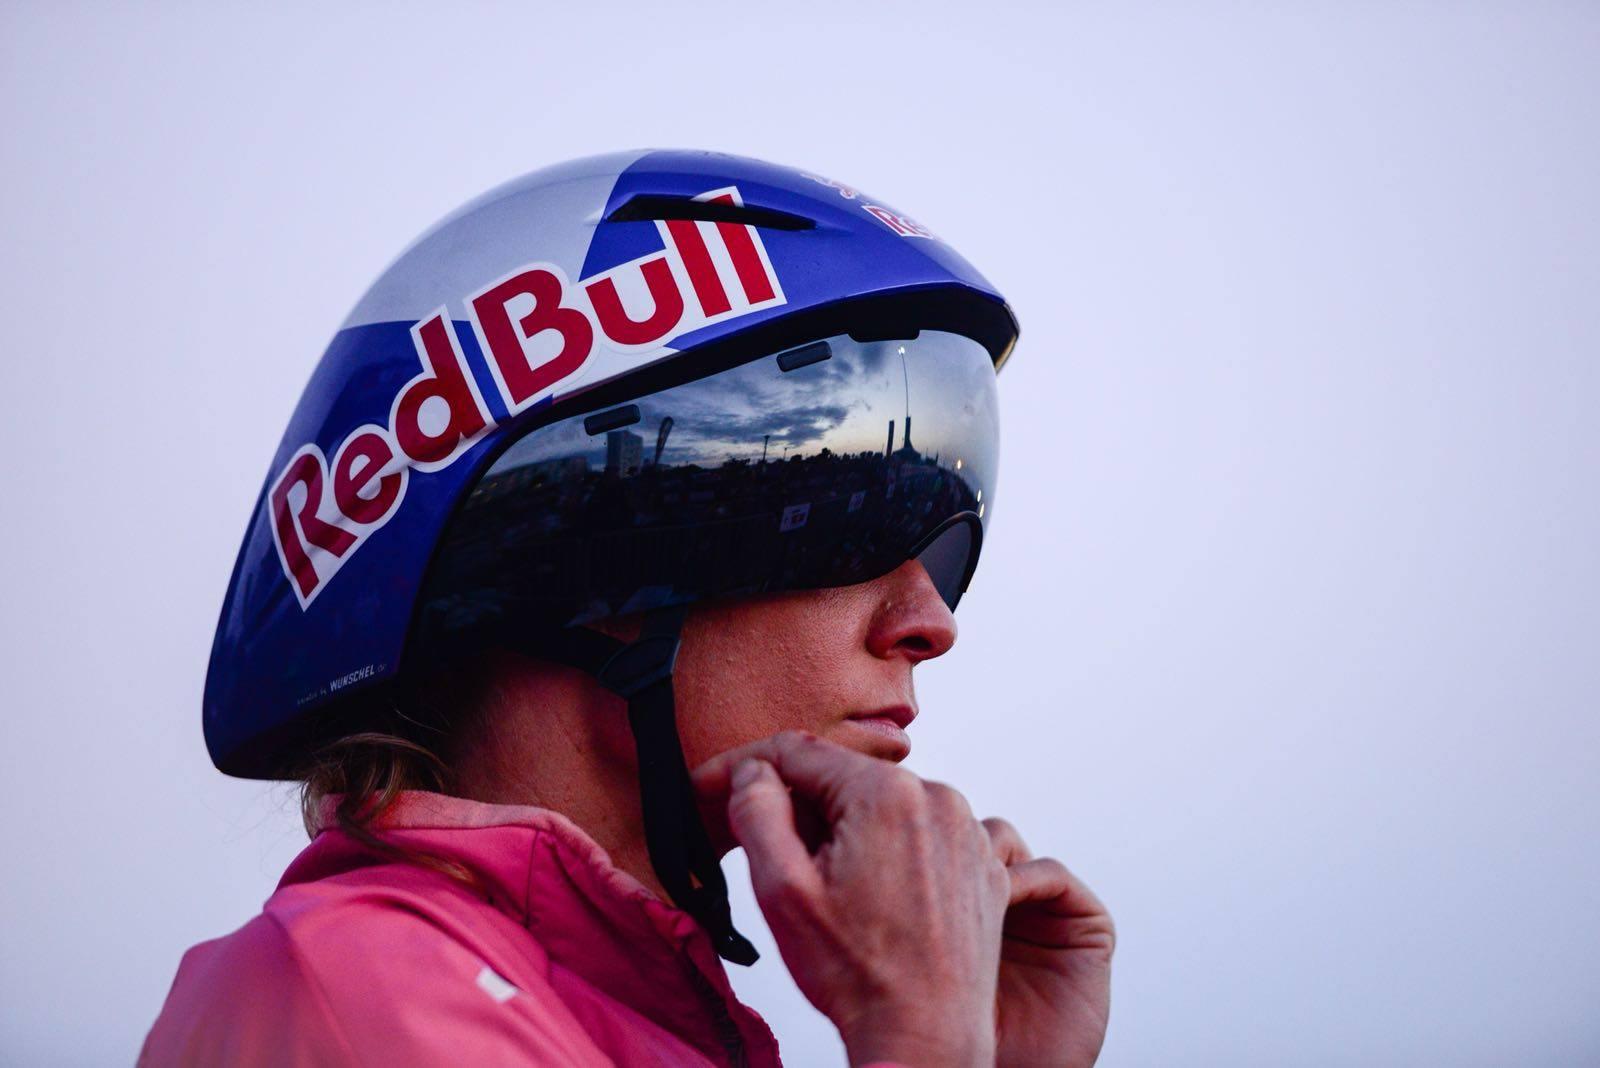 Ironman 70.3 World Championship en vivo (mujeres)